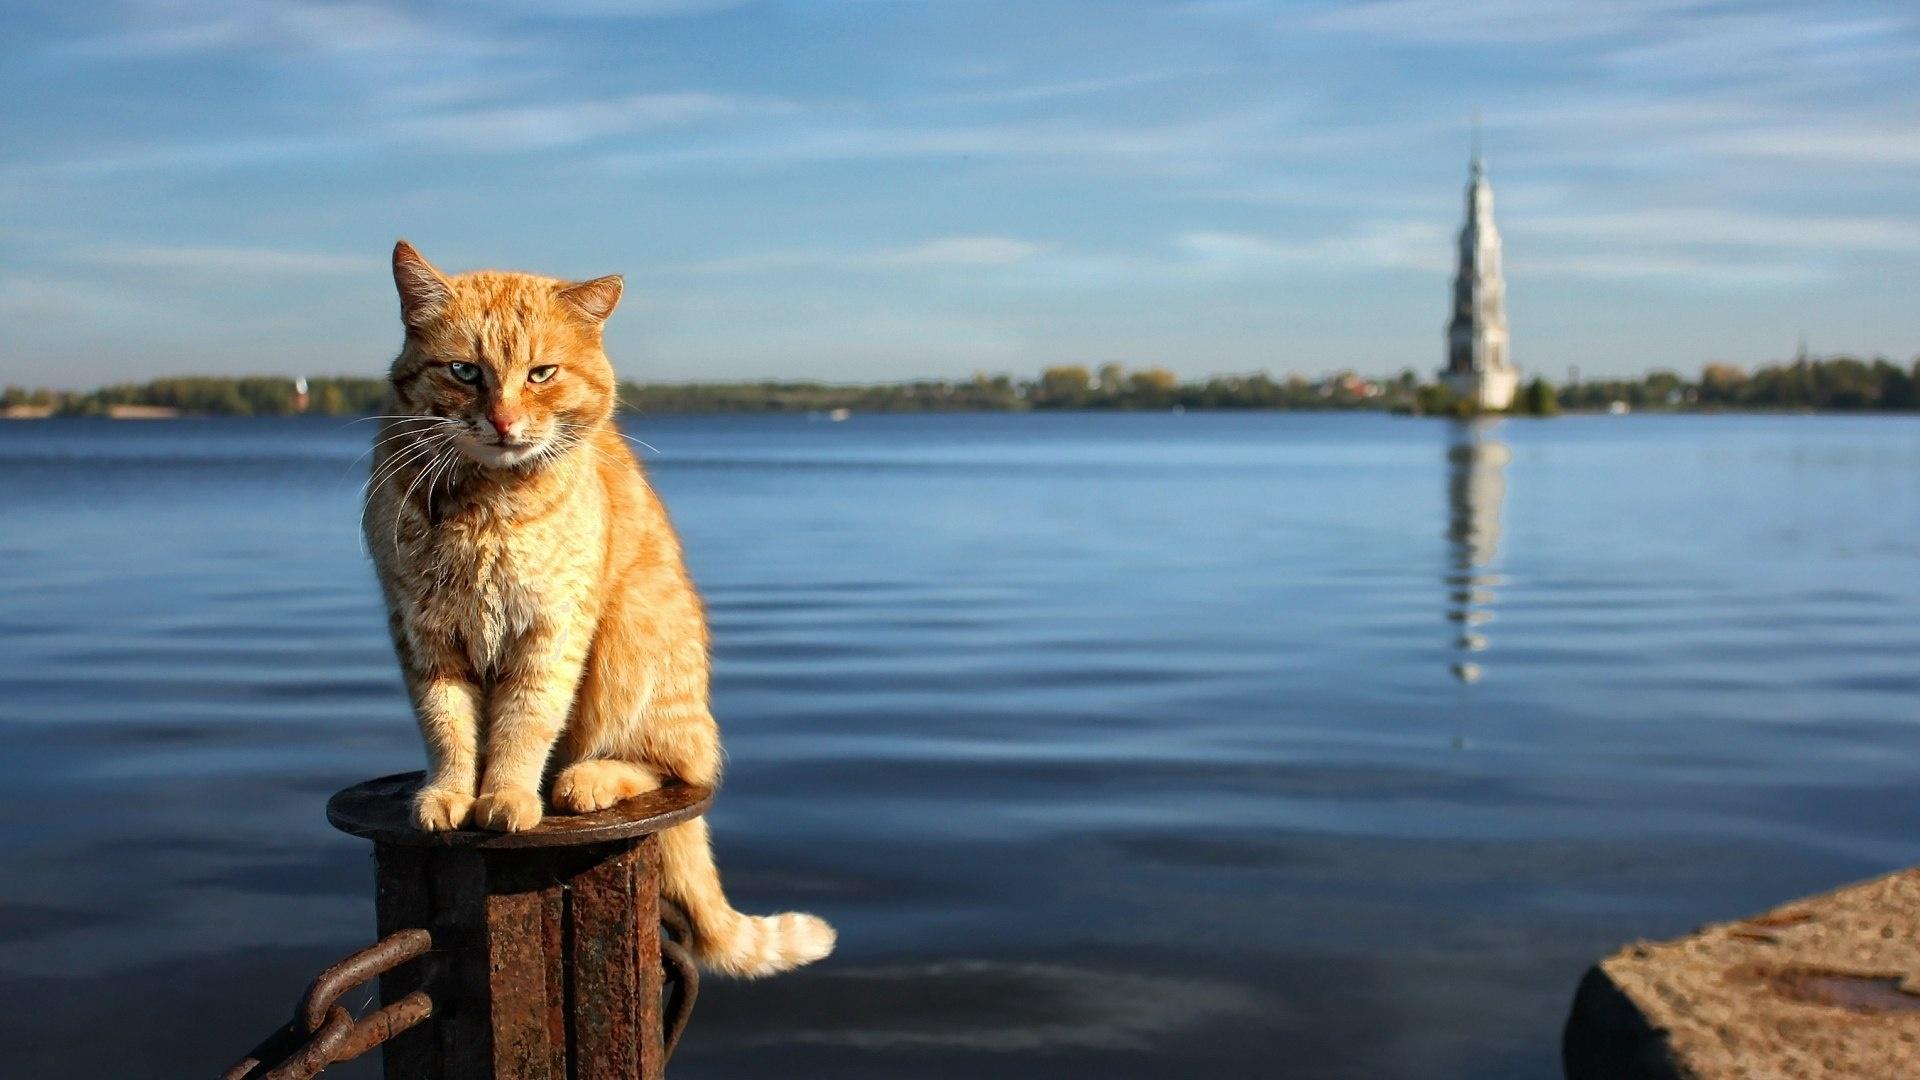 Cat hd background